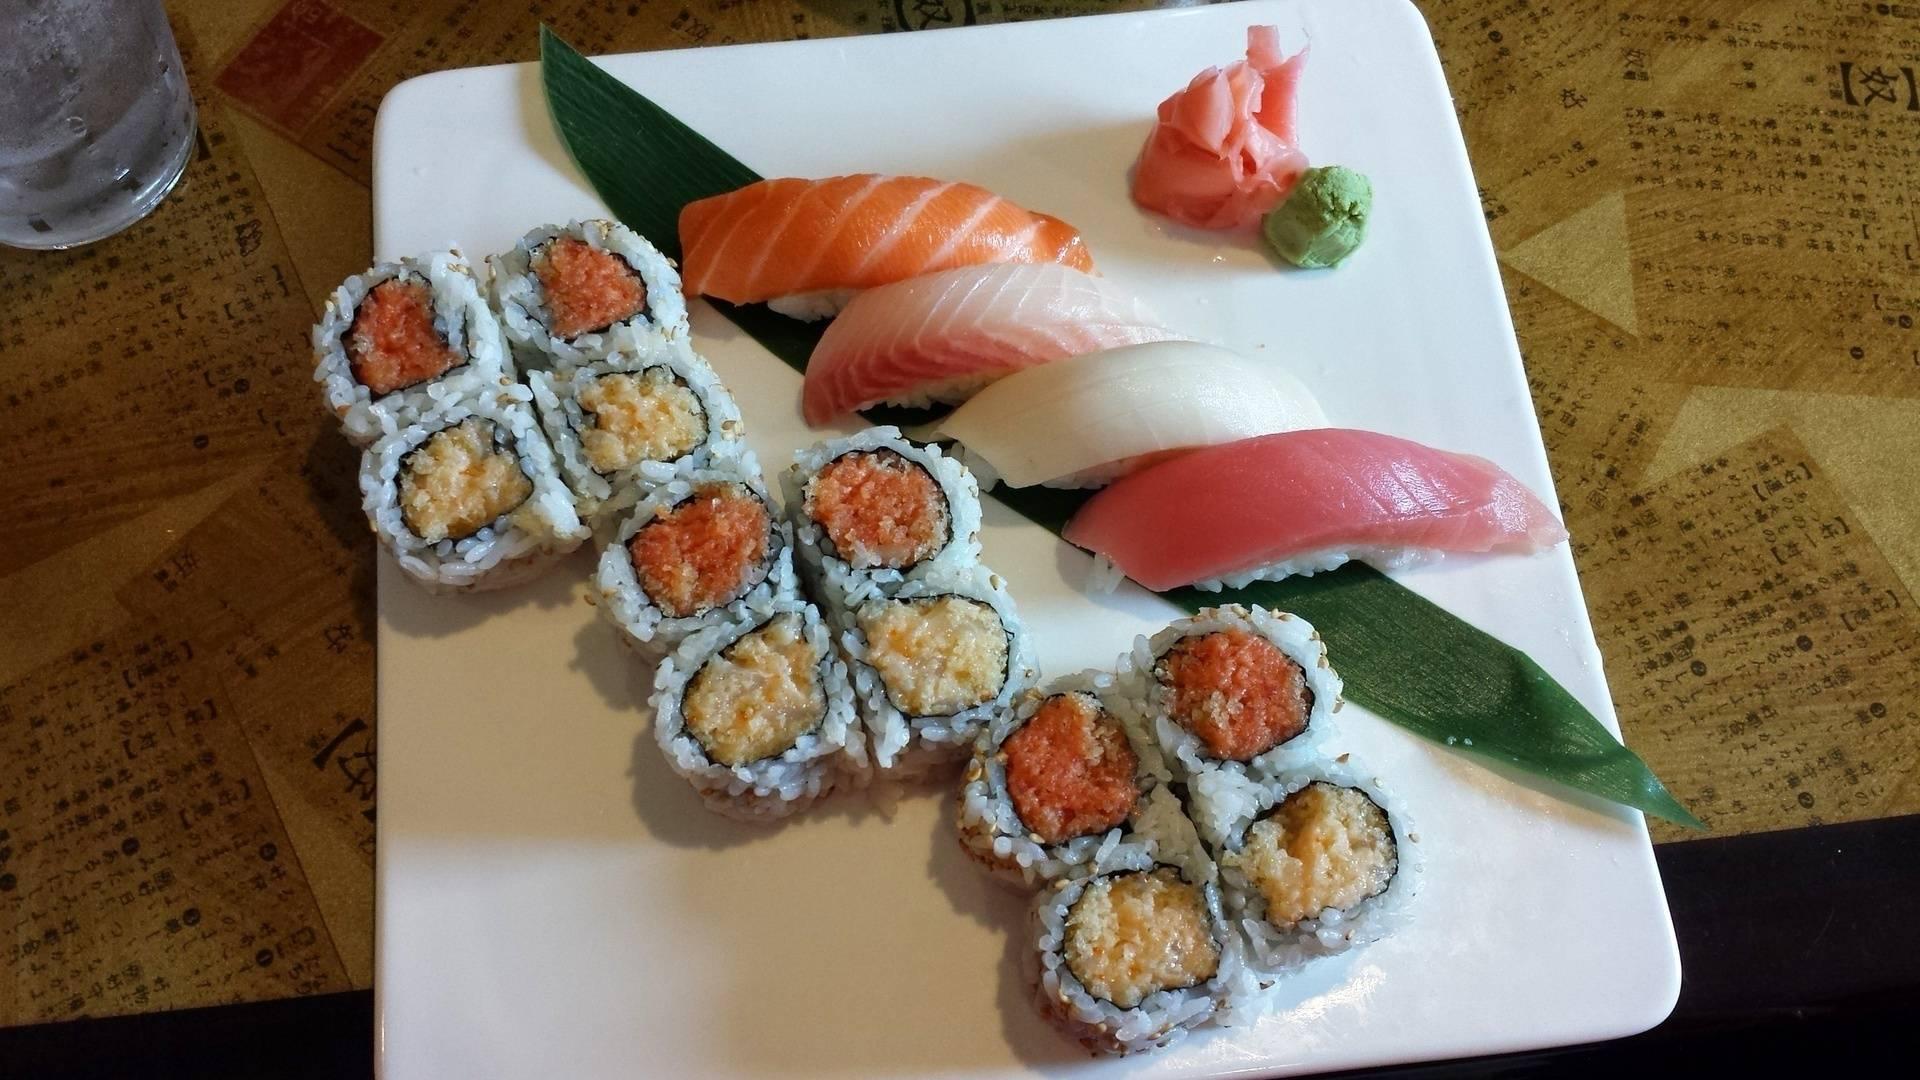 Taste of Asia, Friday night